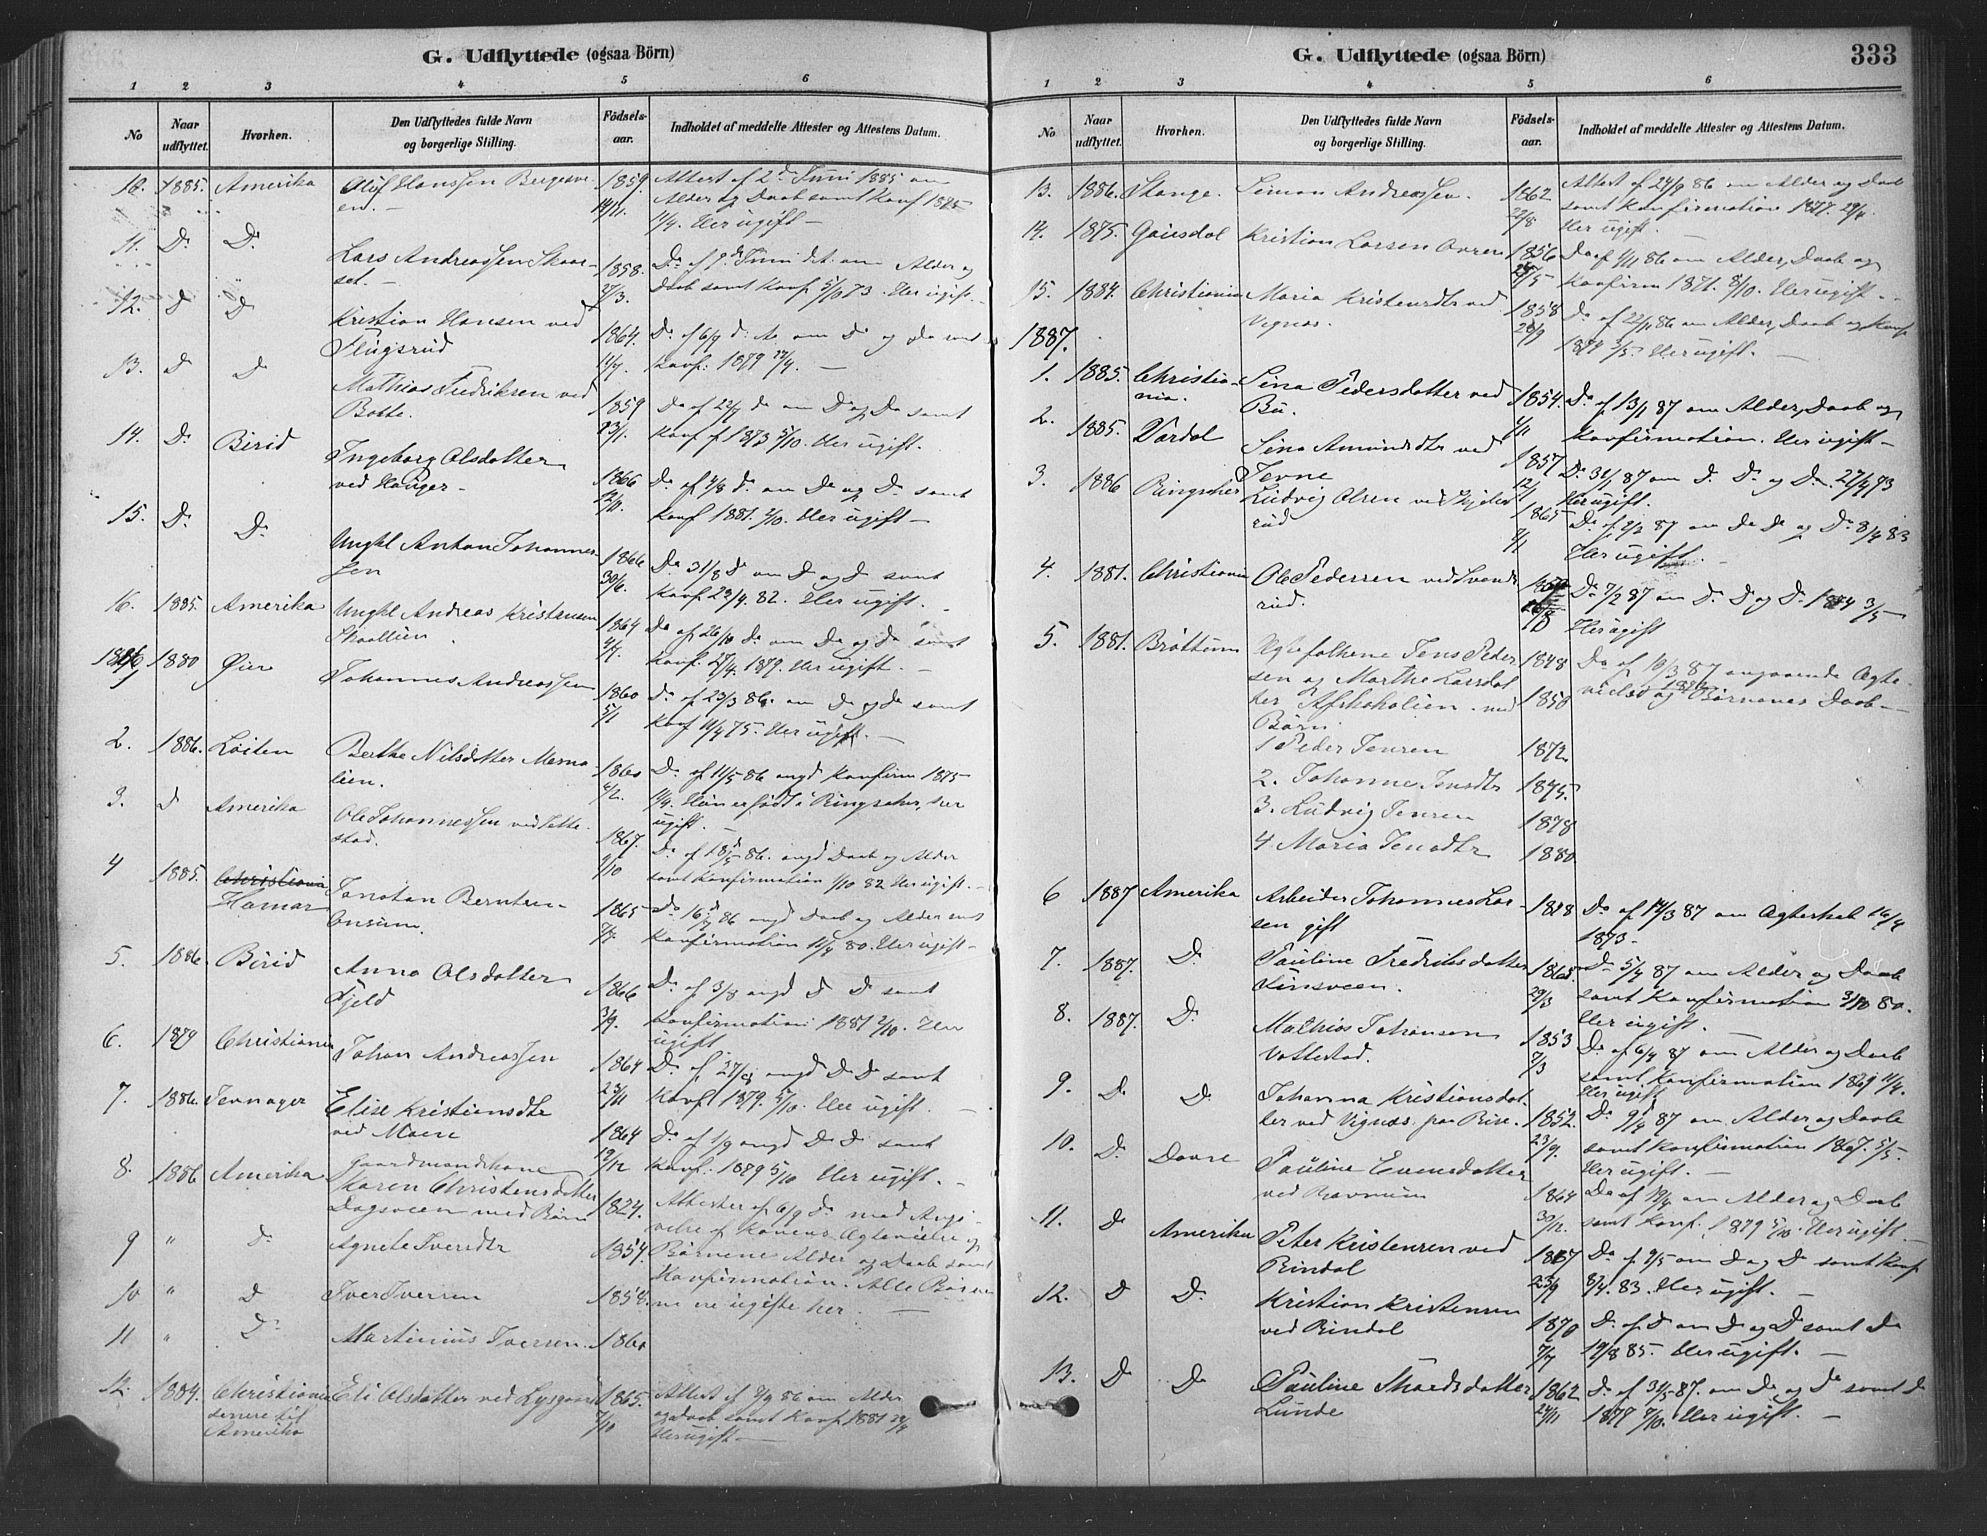 SAH, Fåberg prestekontor, Ministerialbok nr. 9, 1879-1898, s. 333